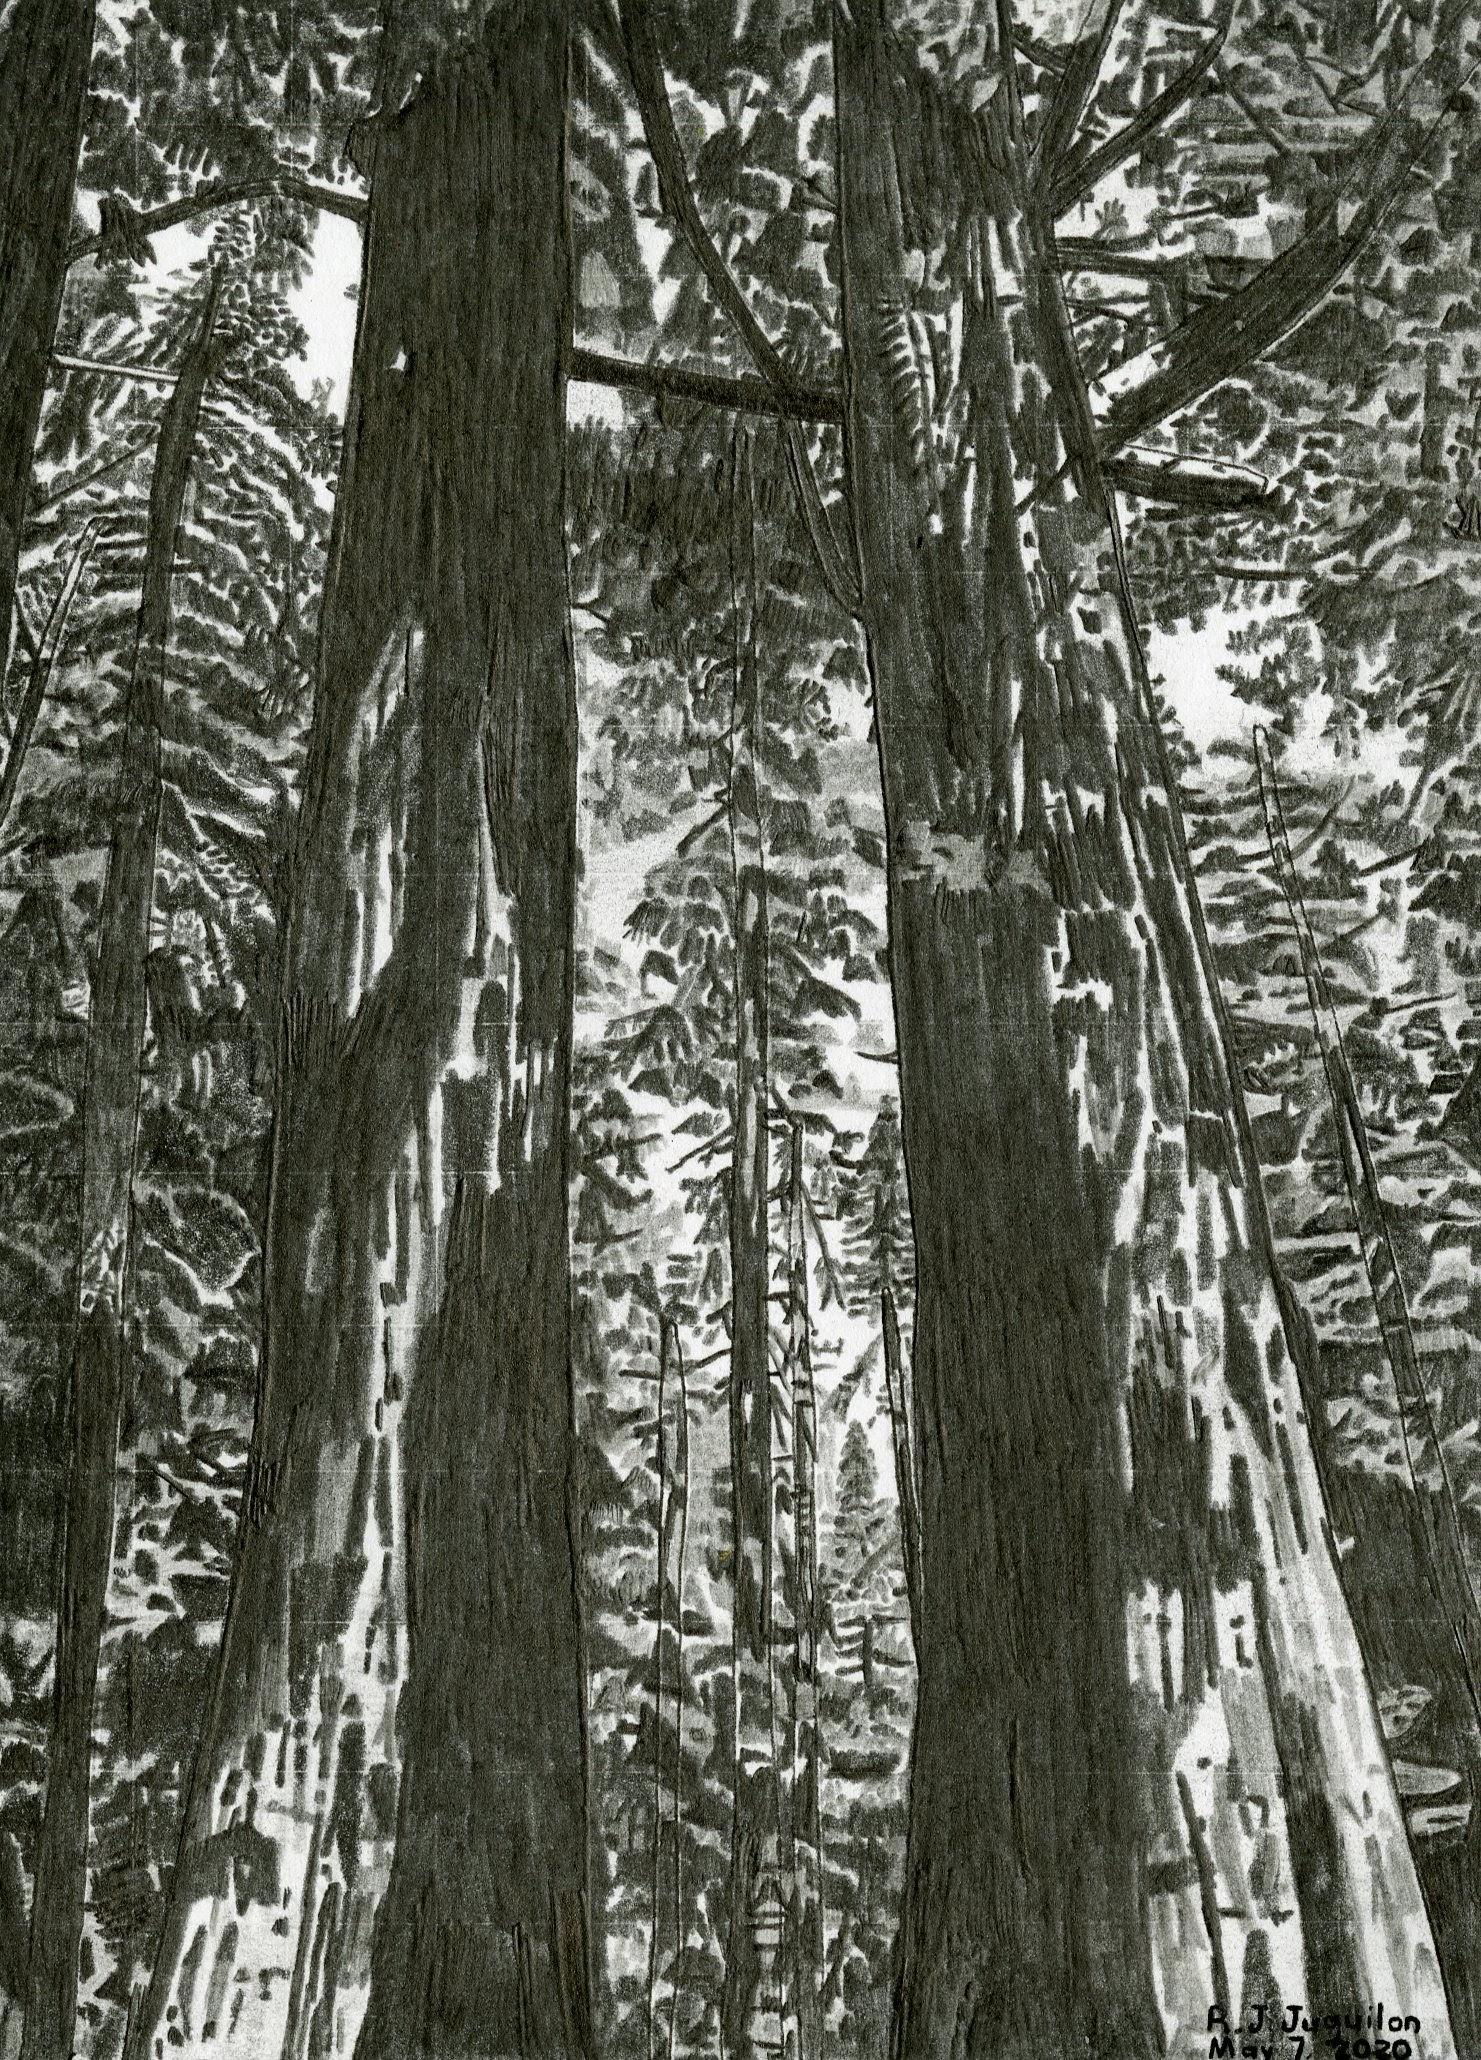 """Sequoias in California"" by R.J. Juguilon"